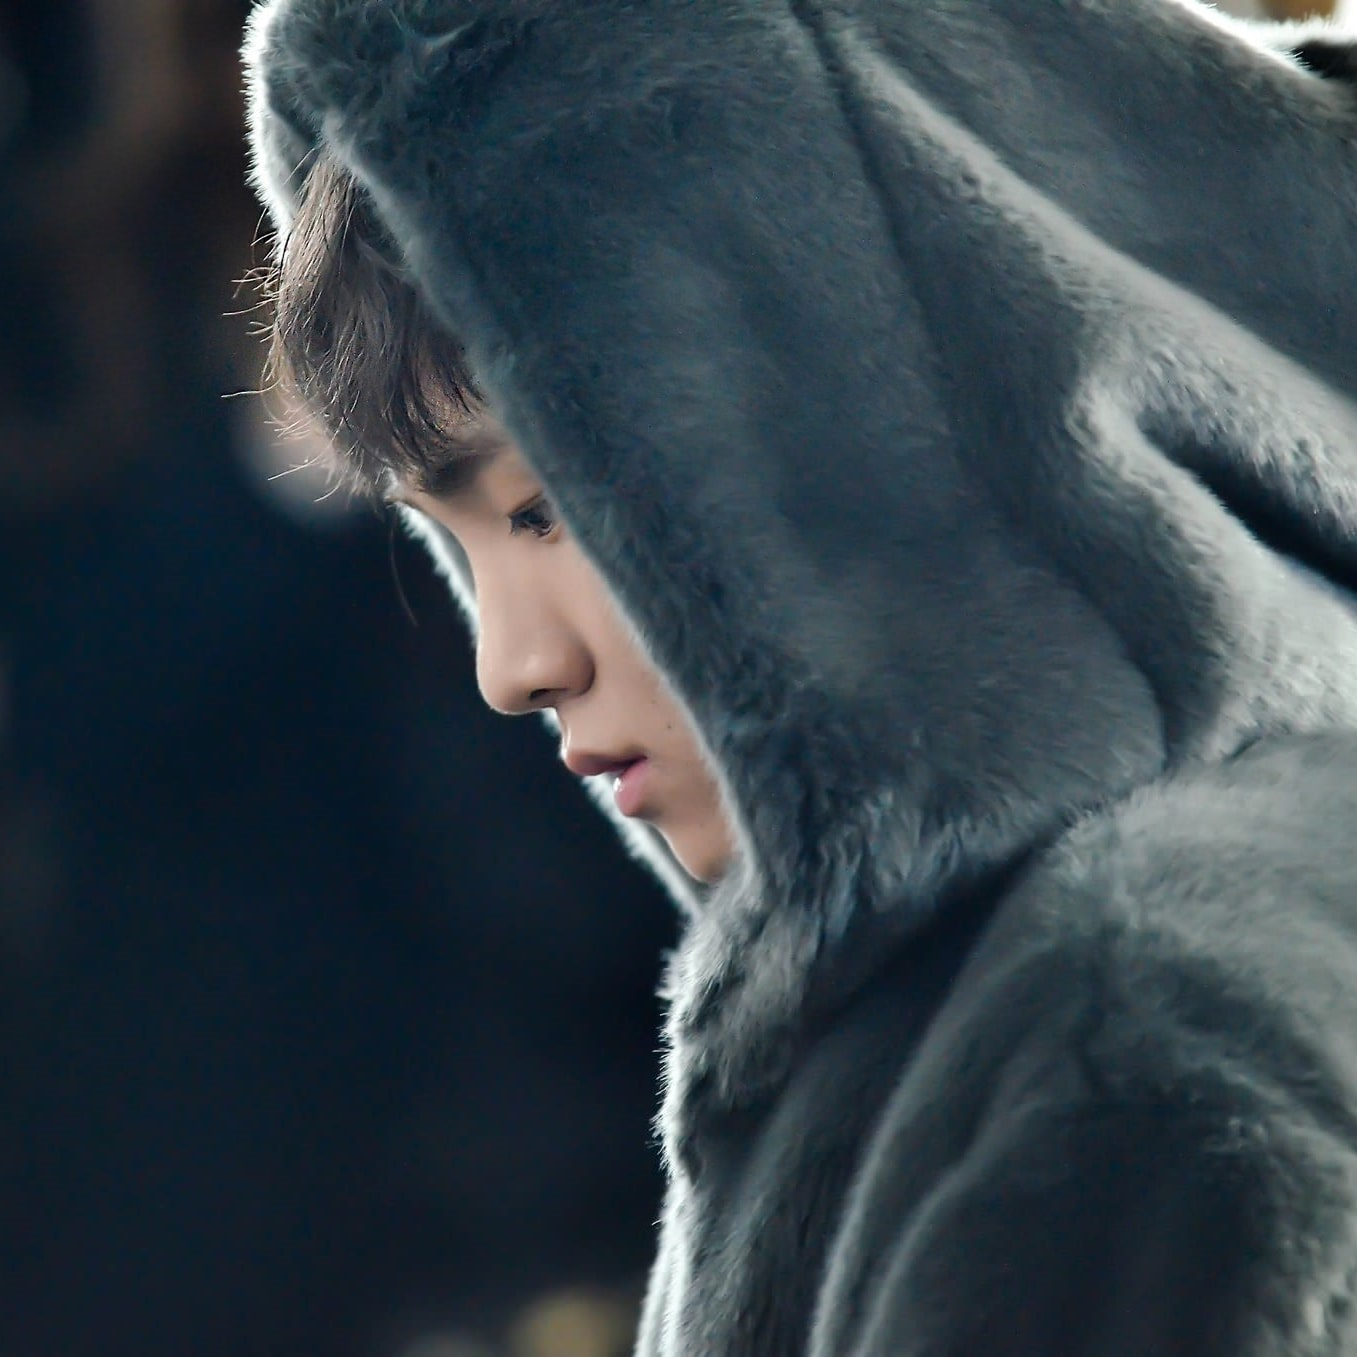 Go to Lee Jin Ran's profile